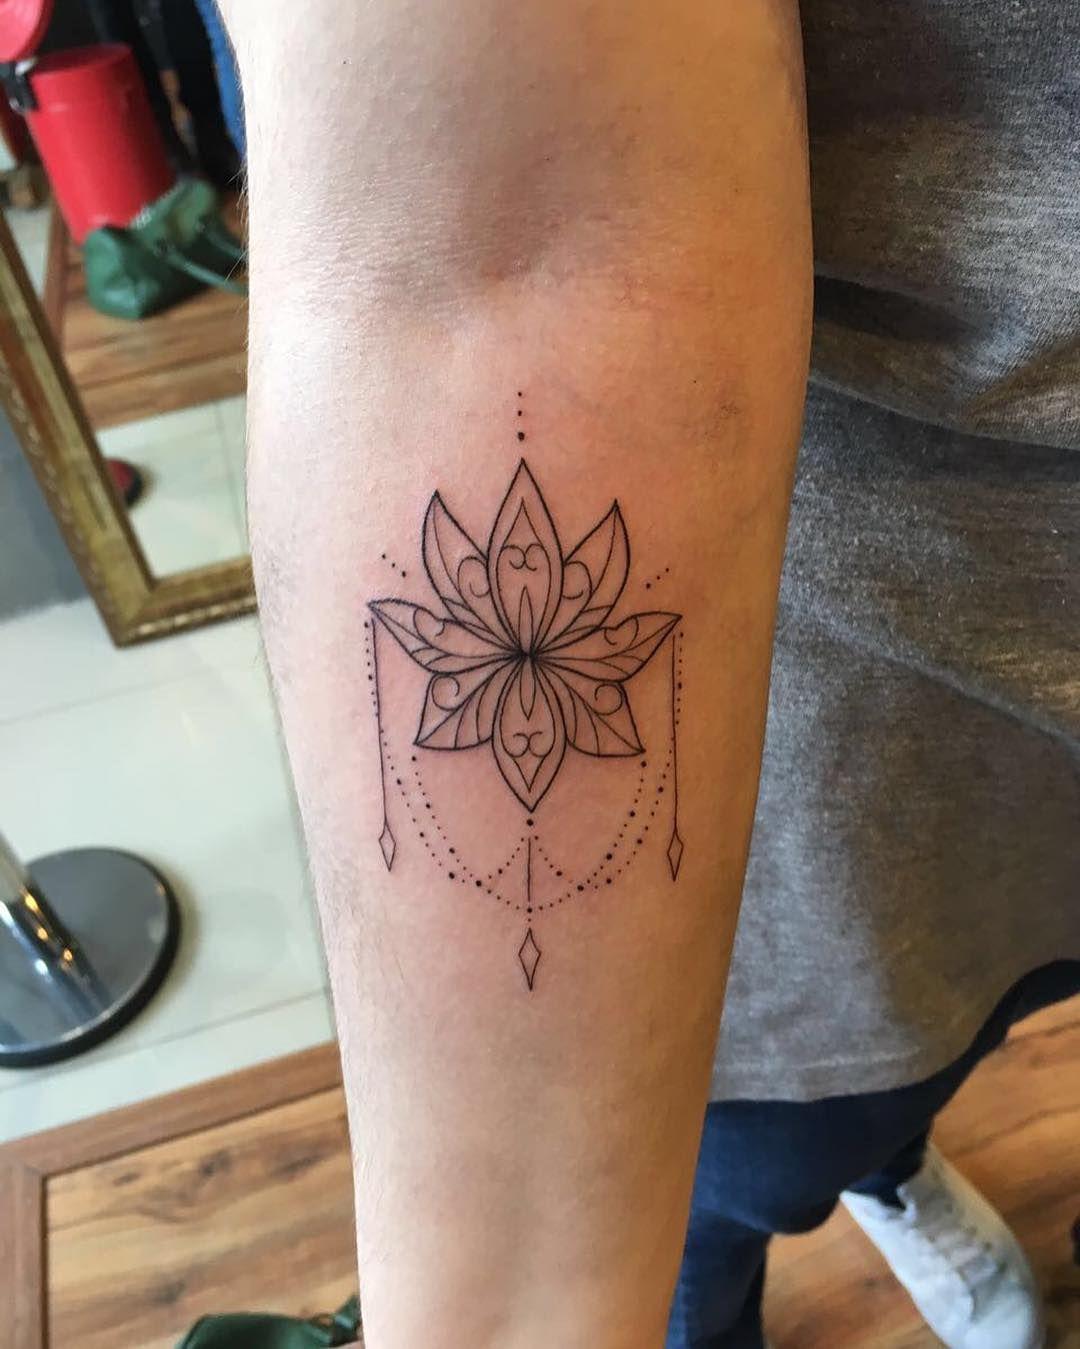 Pin by emma caleigh on tat inspo pinterest lotus tattoo and tatting tattos lotus tattoo rio de janeiro lotus flower lotus flowers izmirmasajfo